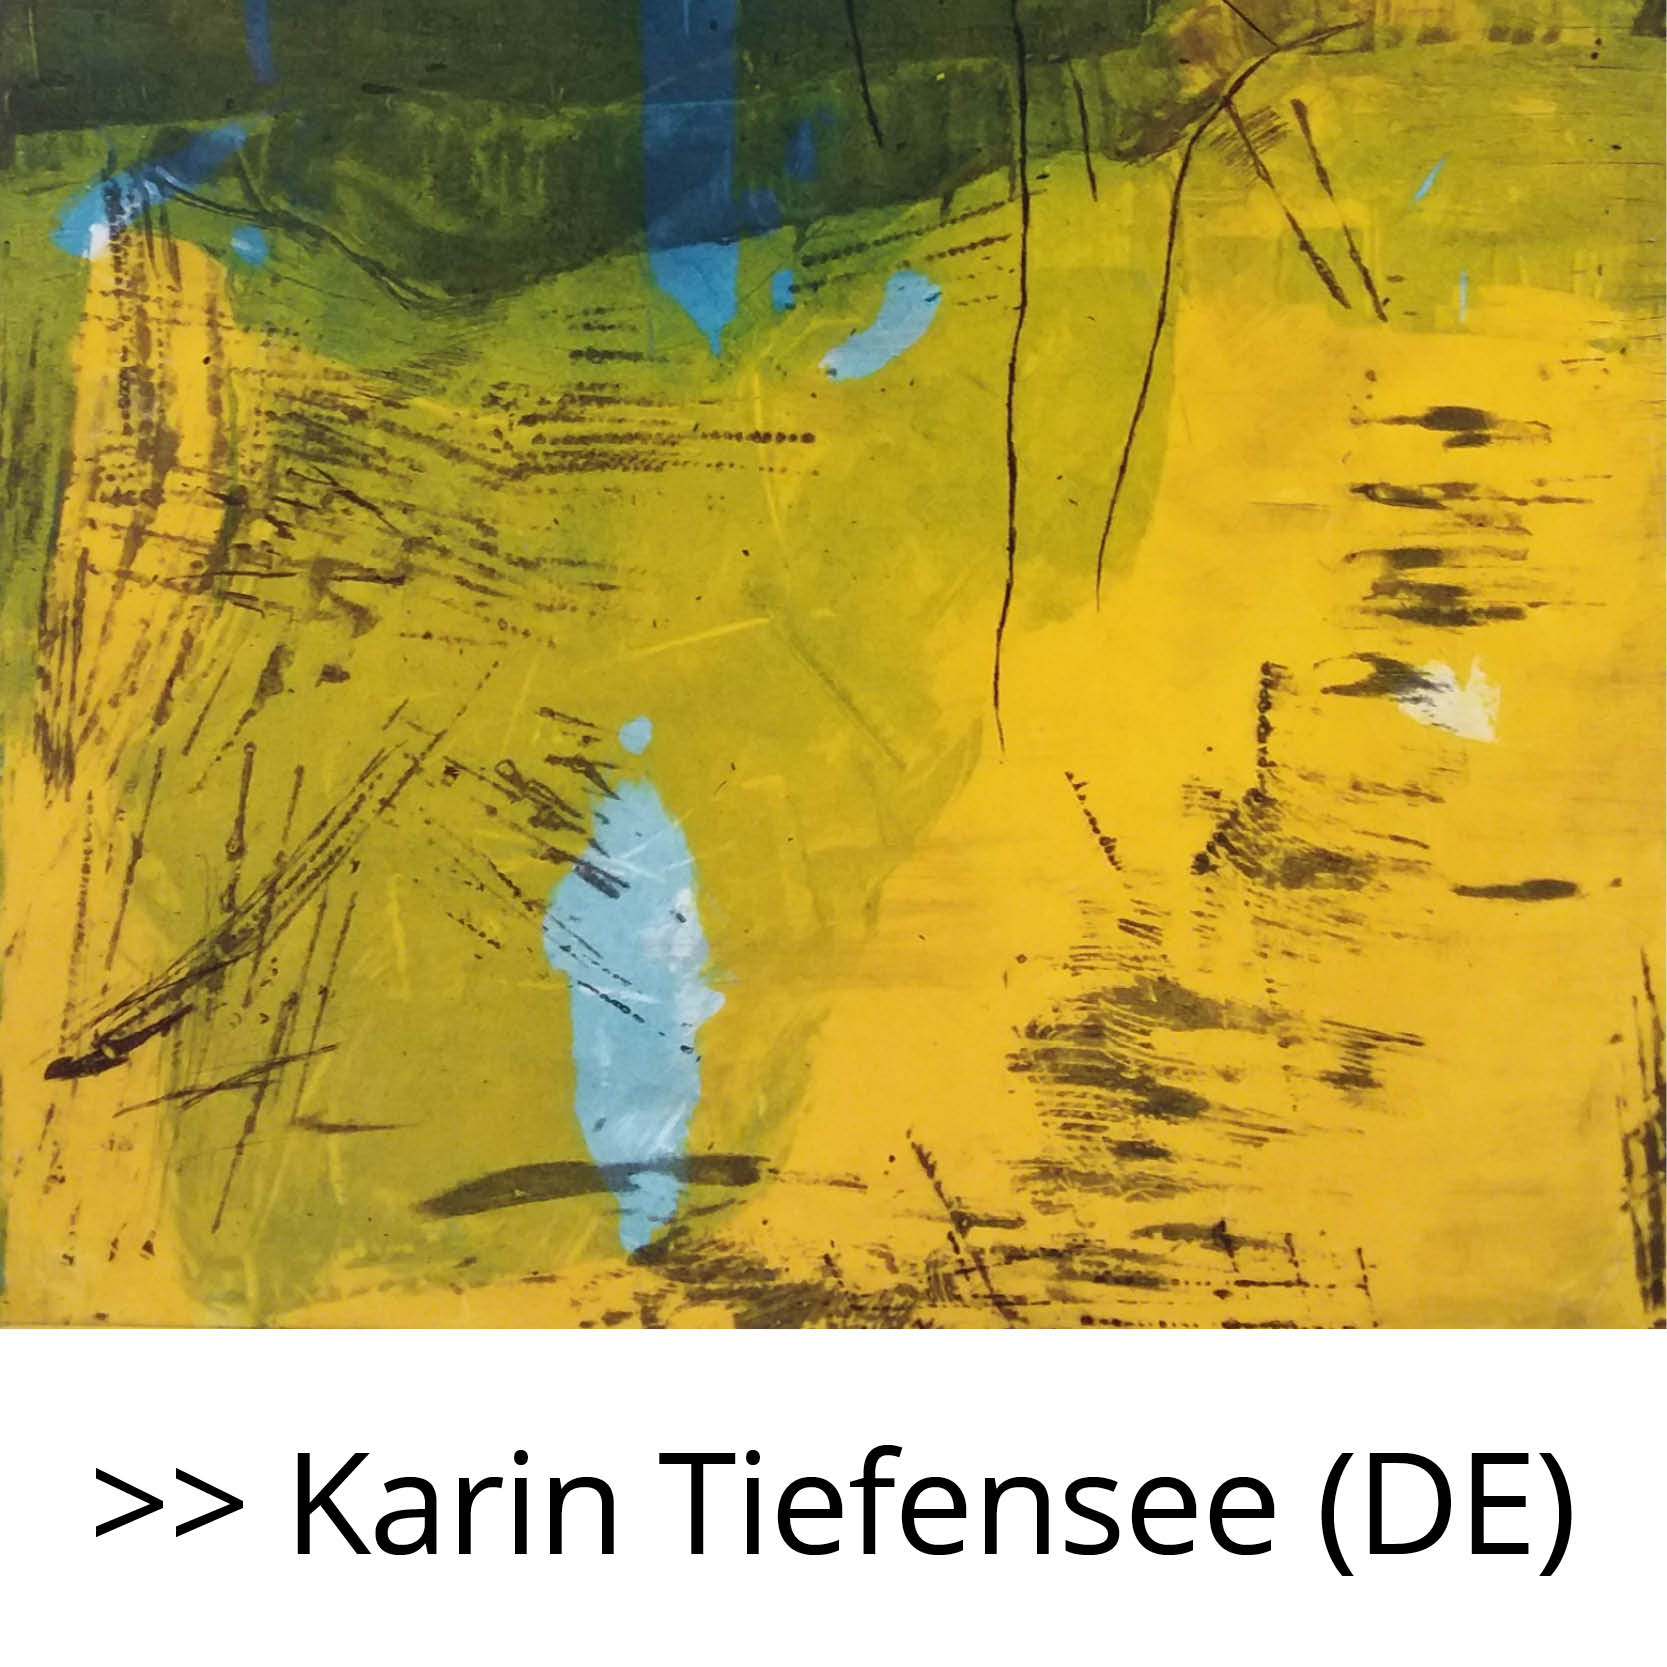 Karin_Tiefensee_(DE)